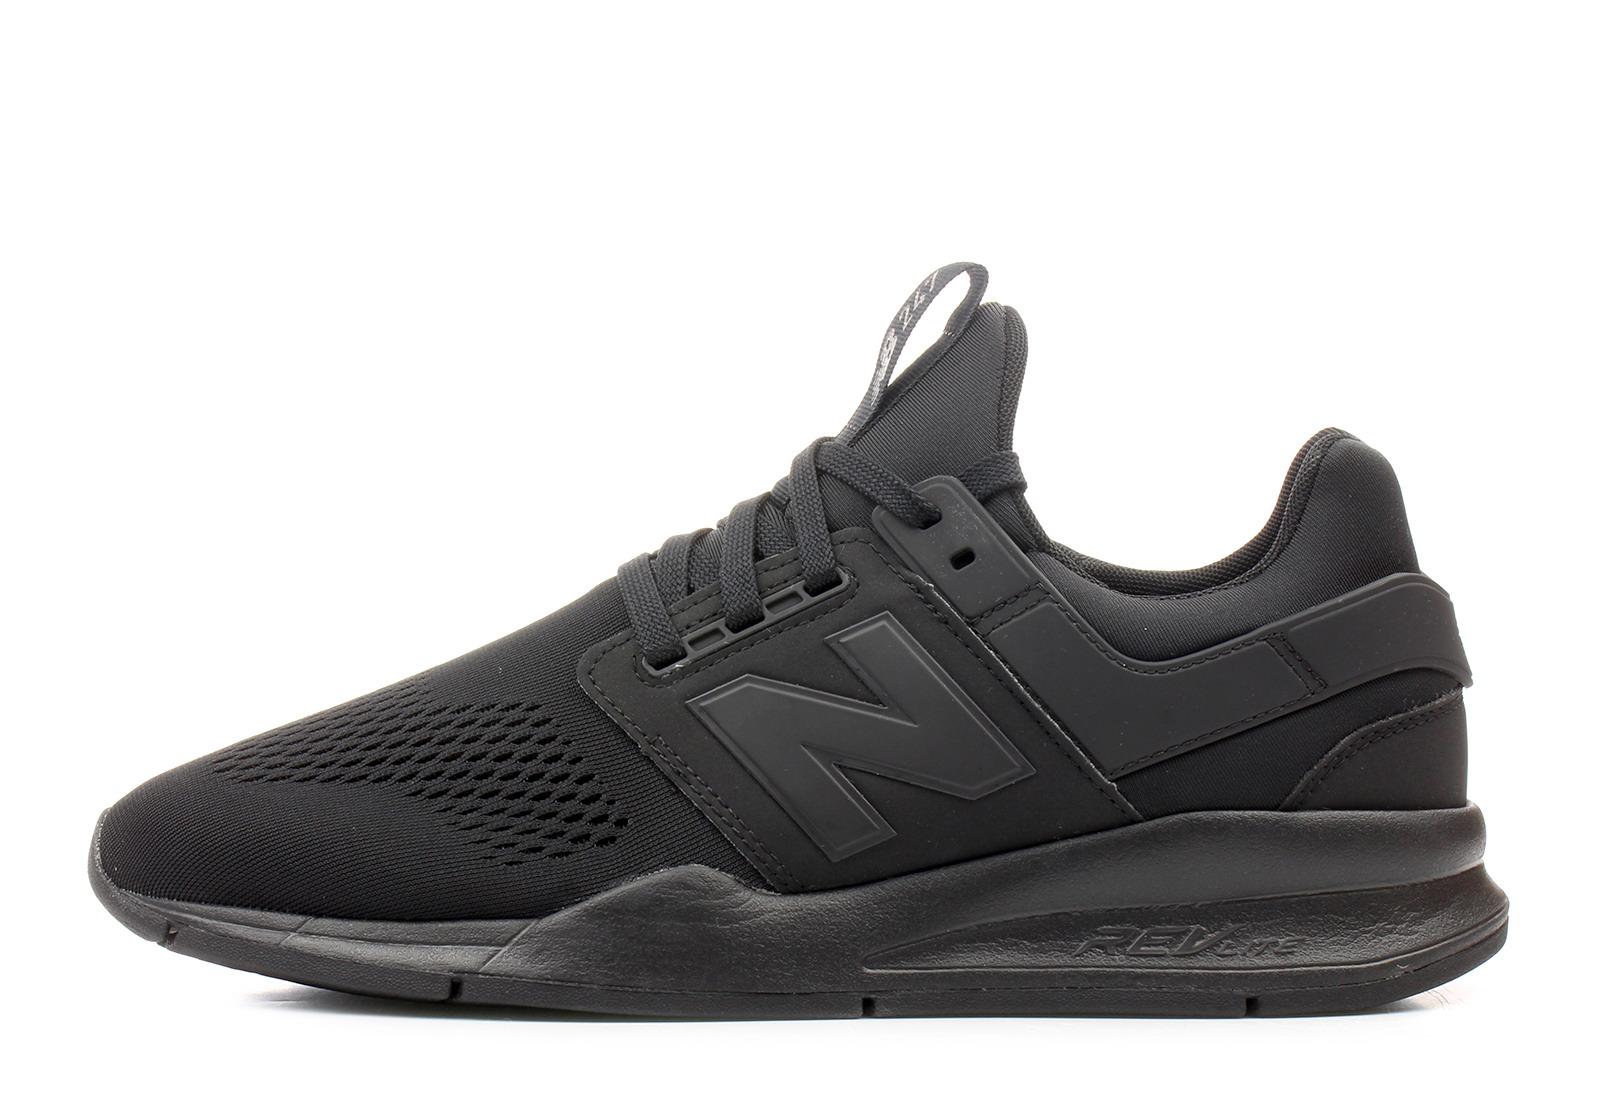 b13831a89ab New Balance Niske Cipele Crne Cipele - Ms247 - Office Shoes - Online  trgovina obuće